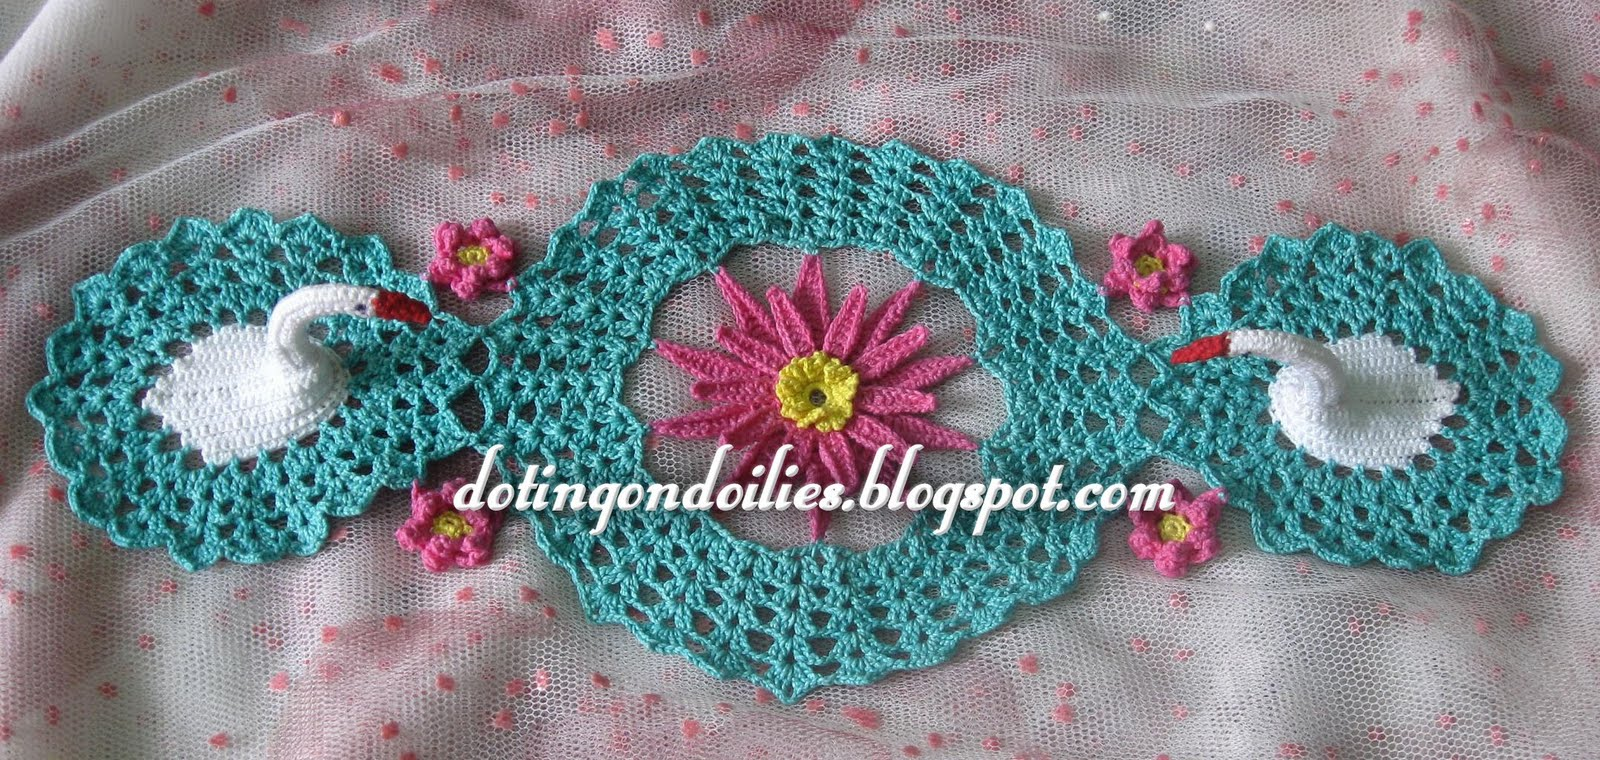 CROCHET DOILY GRAPE - Crochet ? Learn How to Crochet